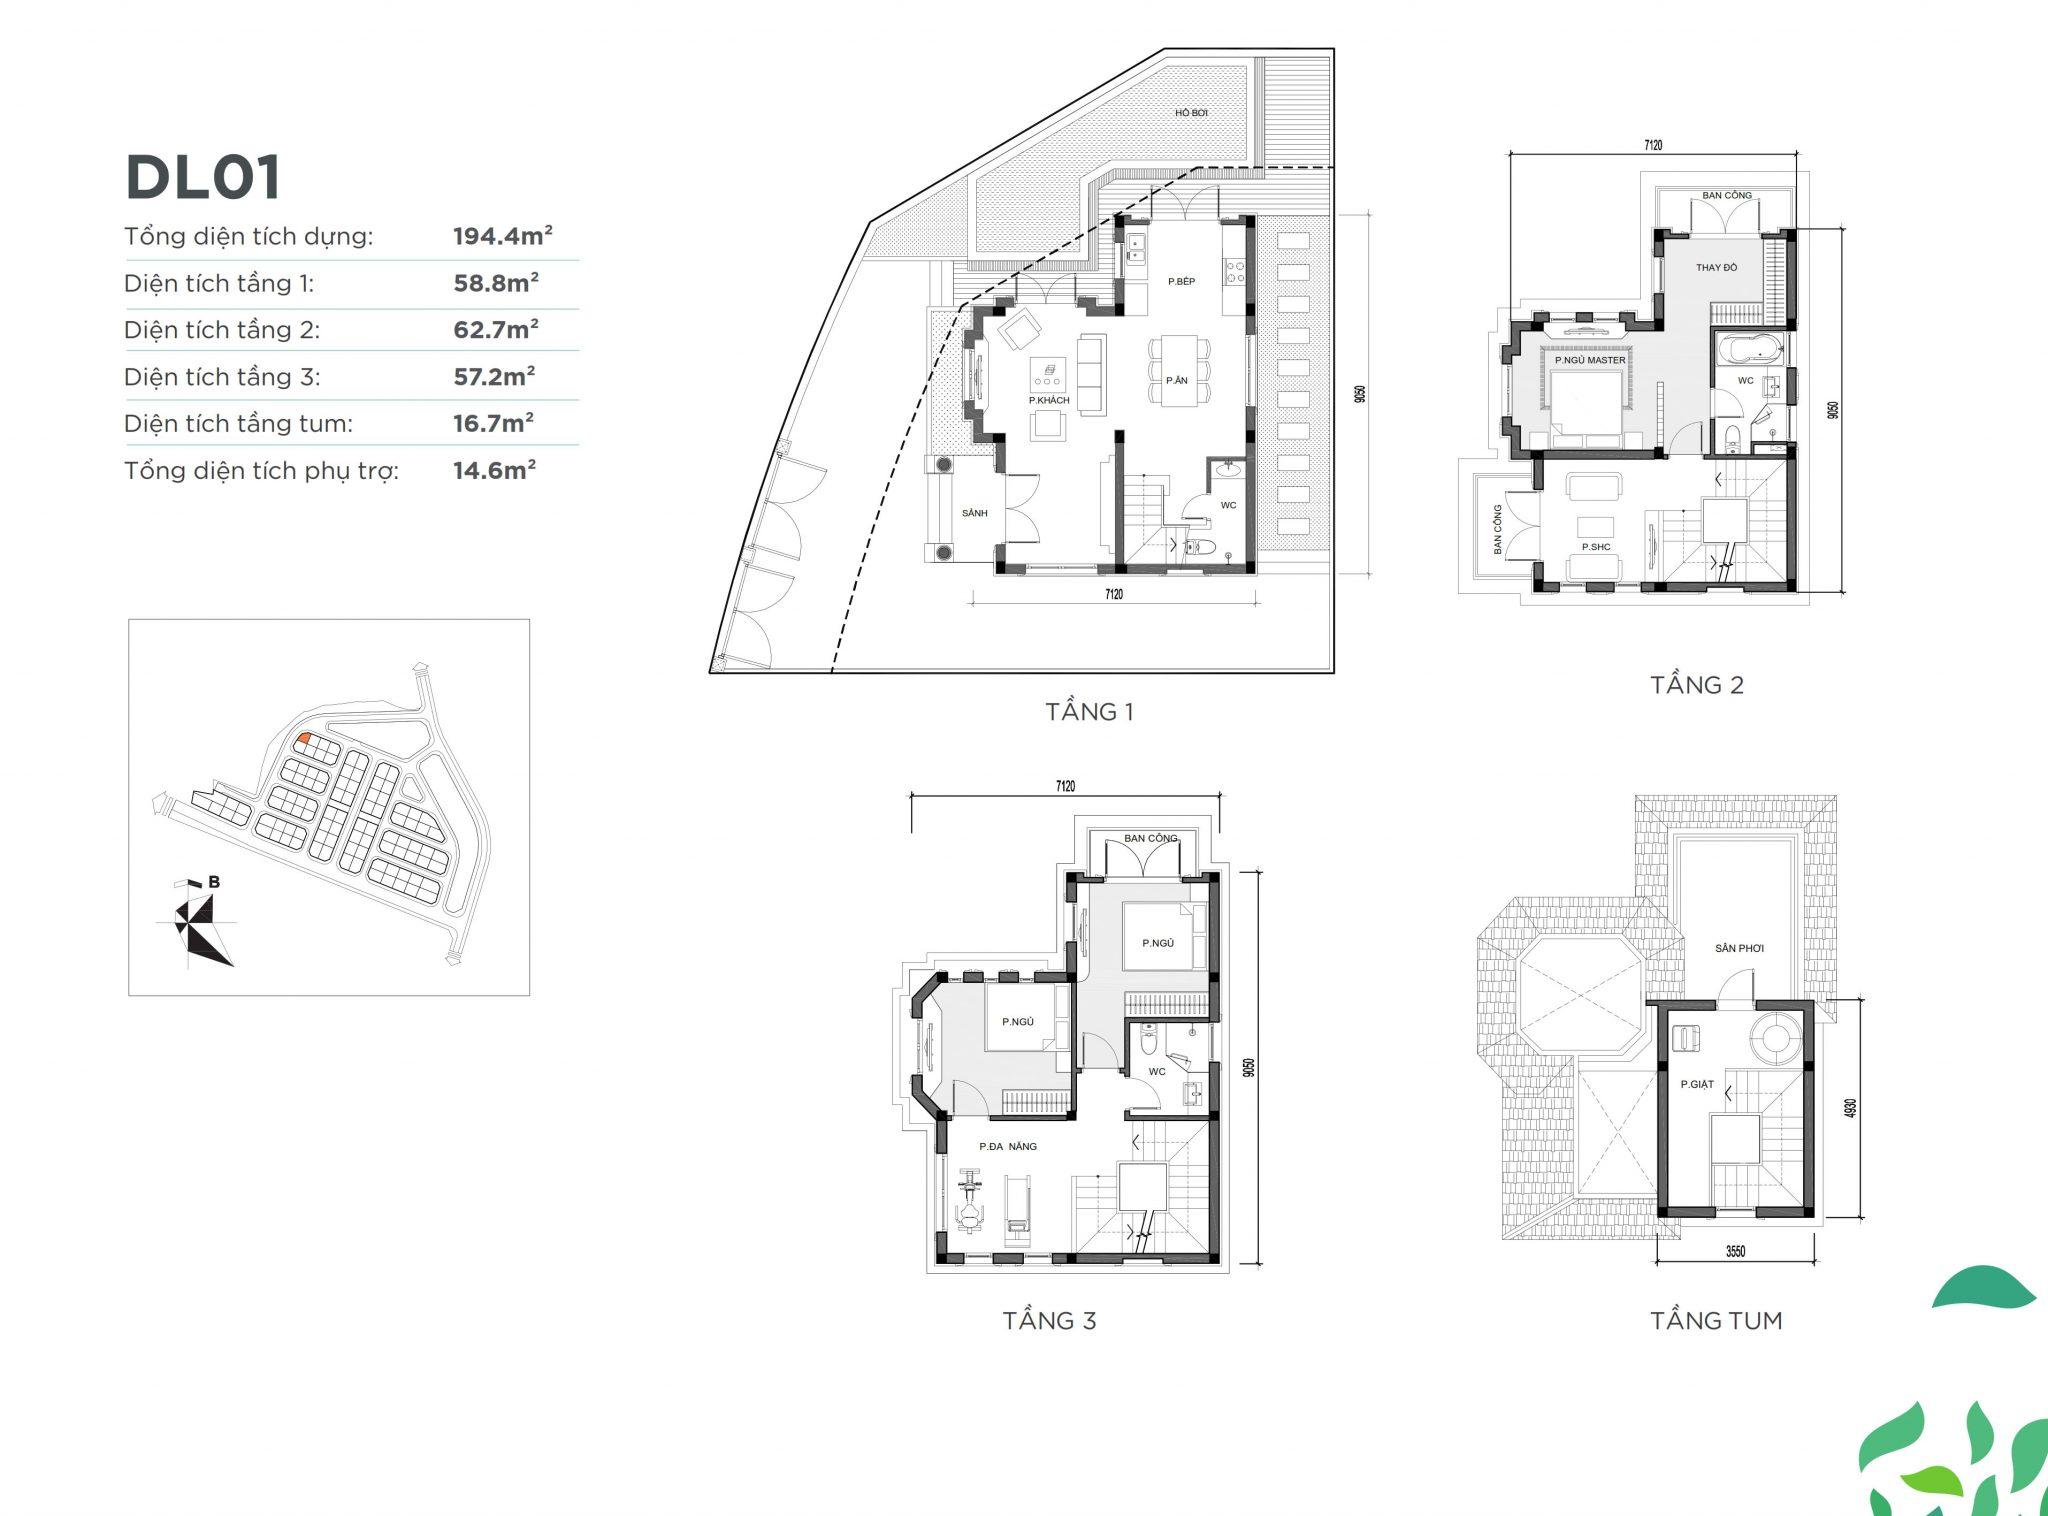 biet-thu-dl01-vinhomes-green-villas